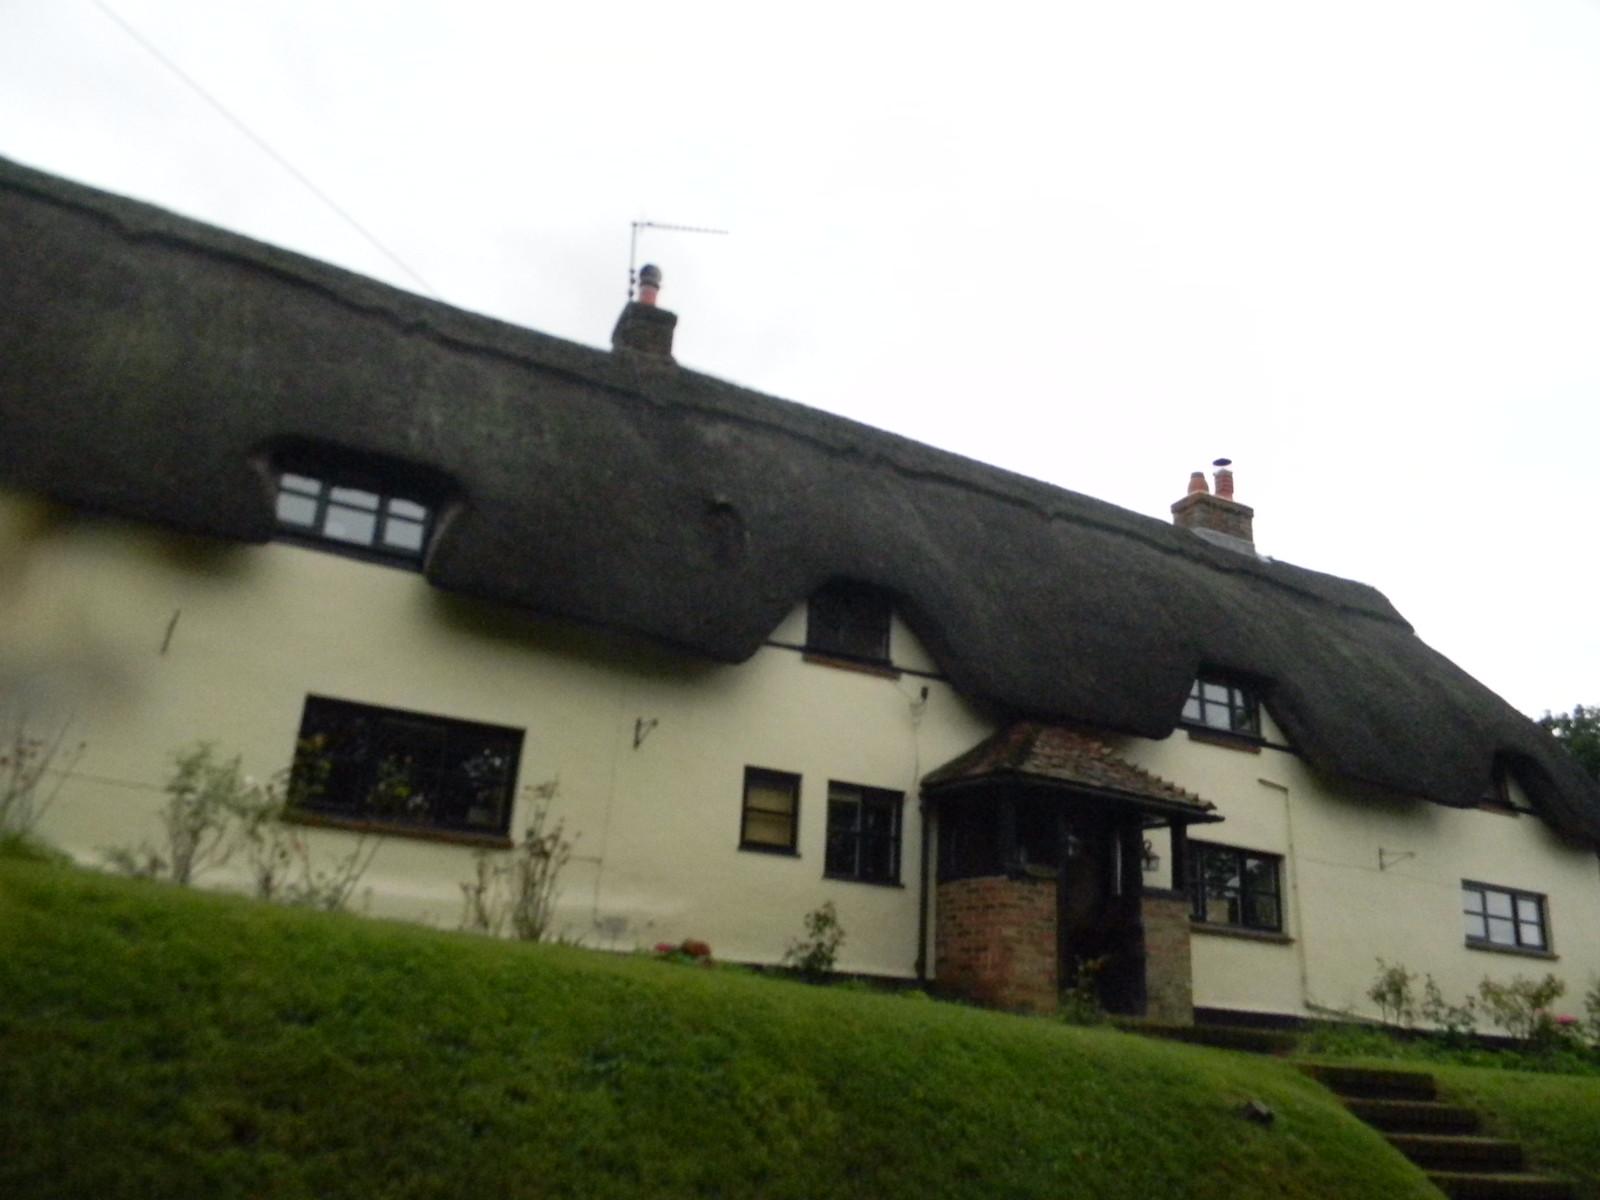 House North waltham Overton Circular